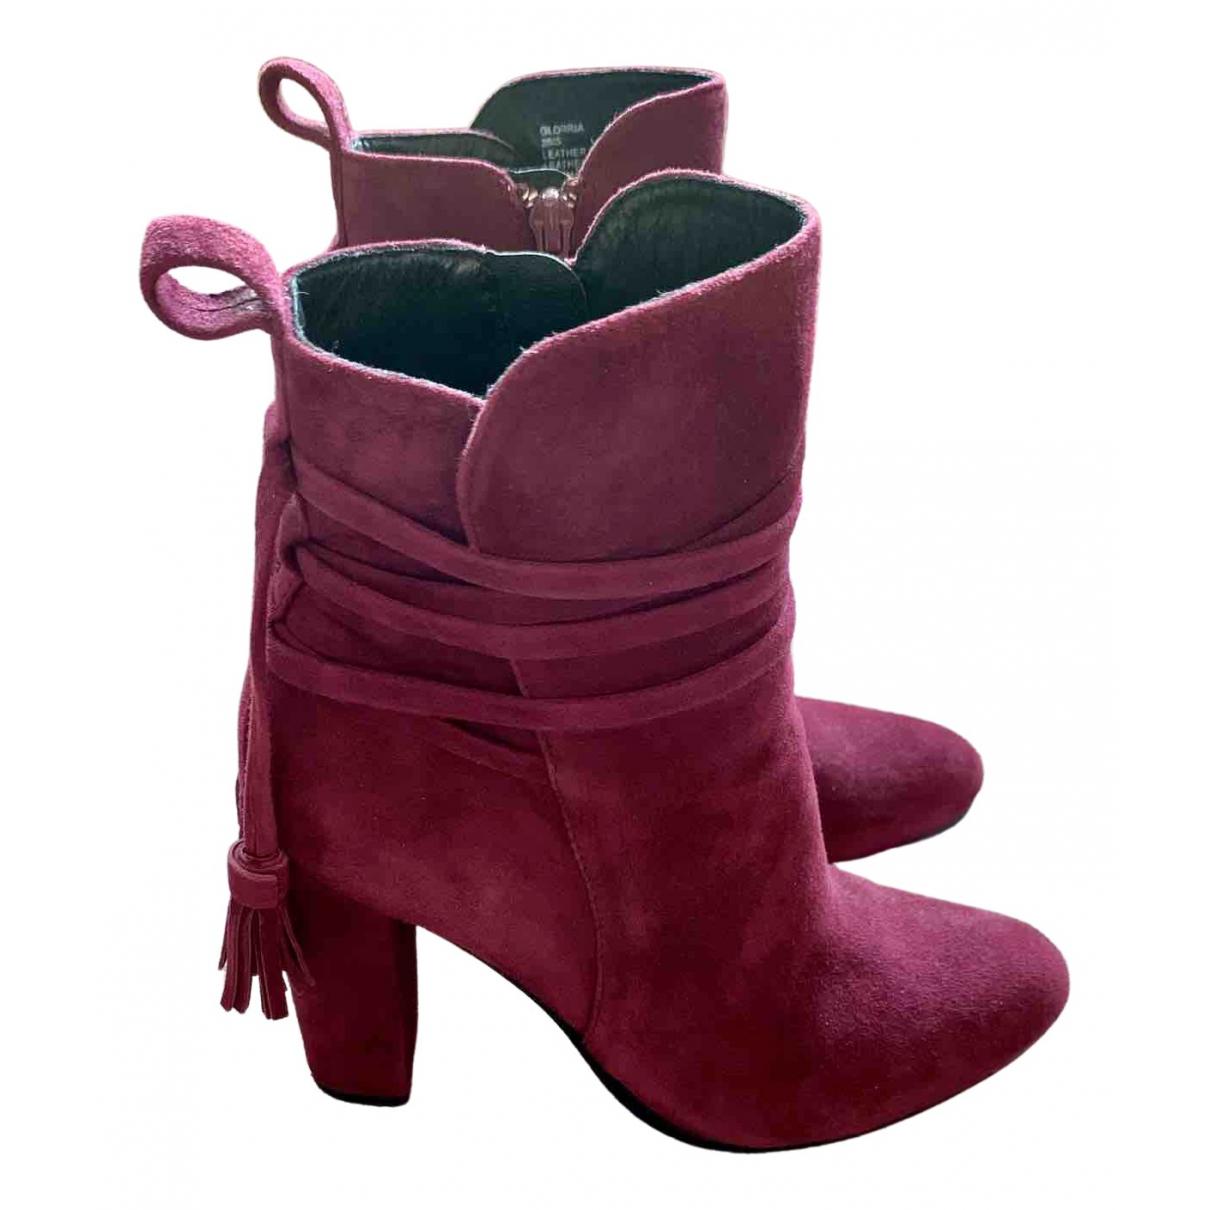 Steve Madden \N Burgundy Suede Boots for Women 38 EU